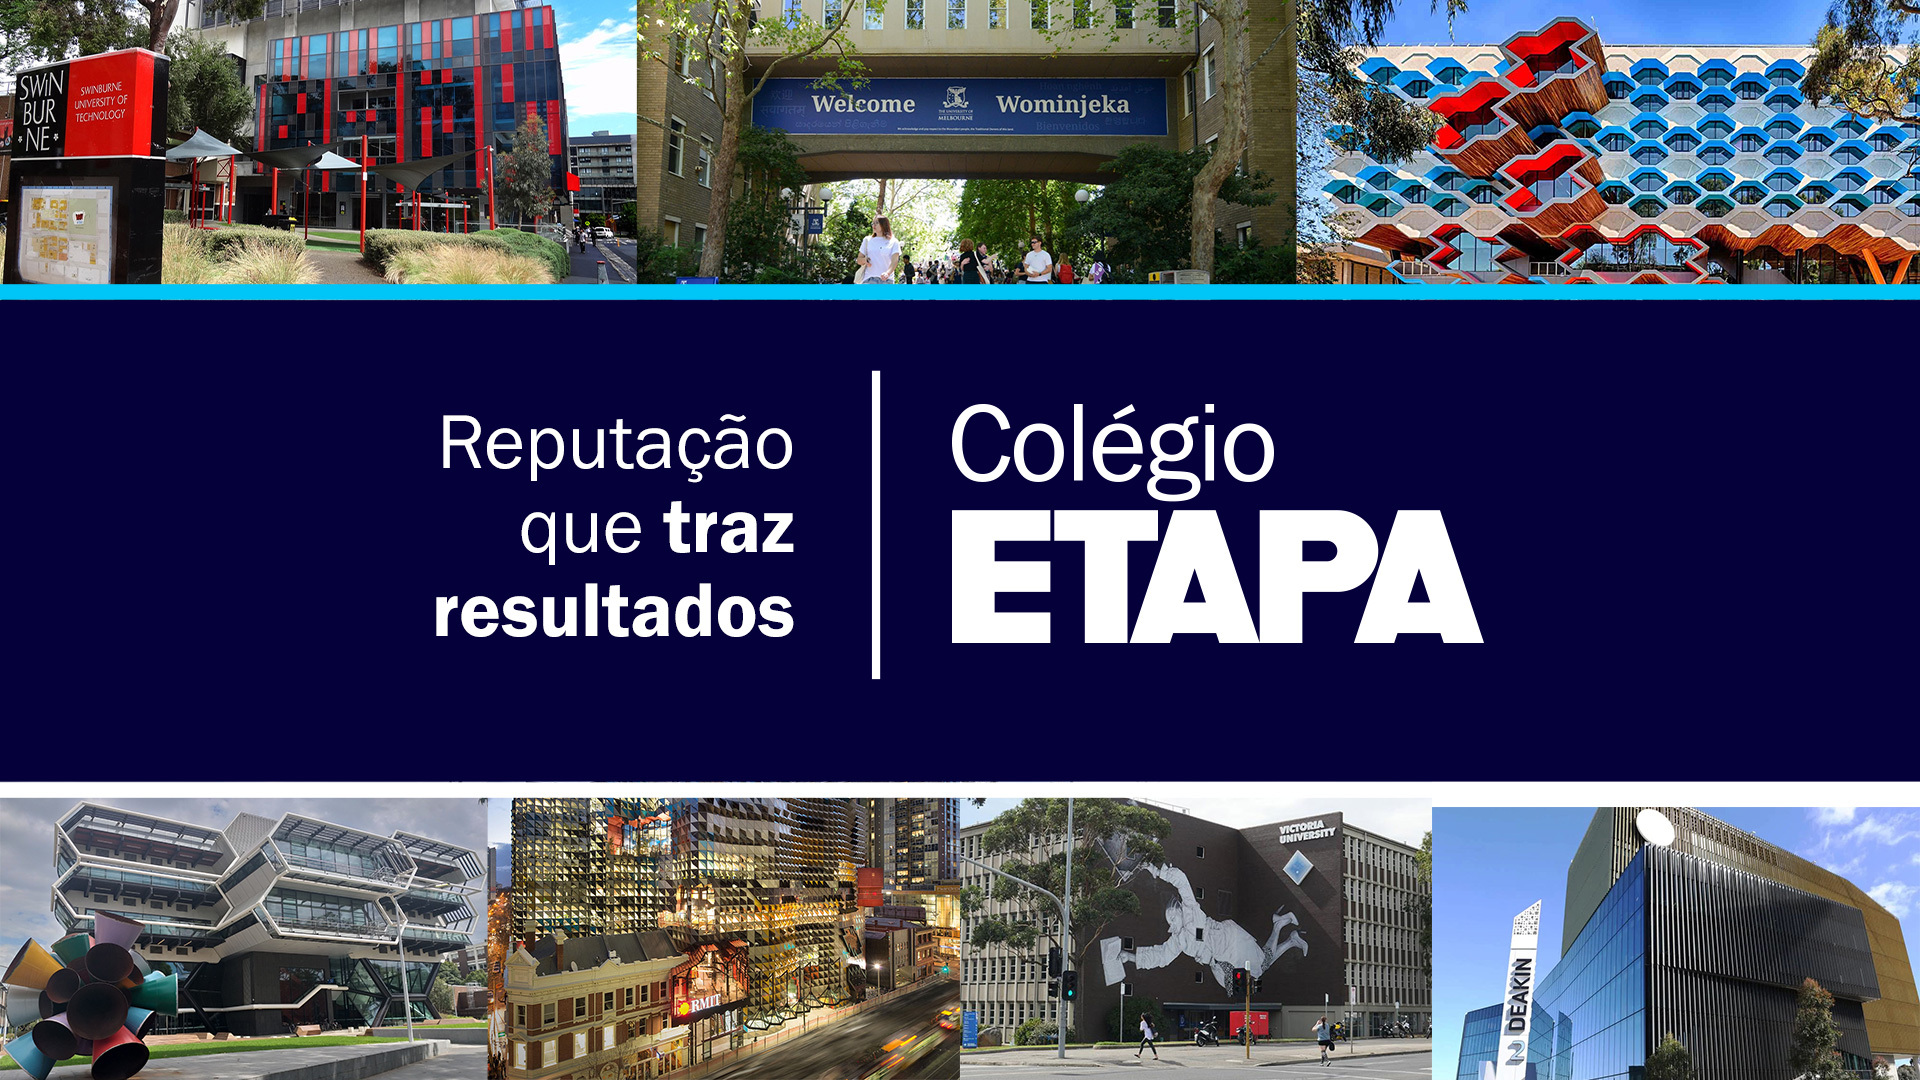 Orientadores educacionais do Etapa visitam universidades na Austrália